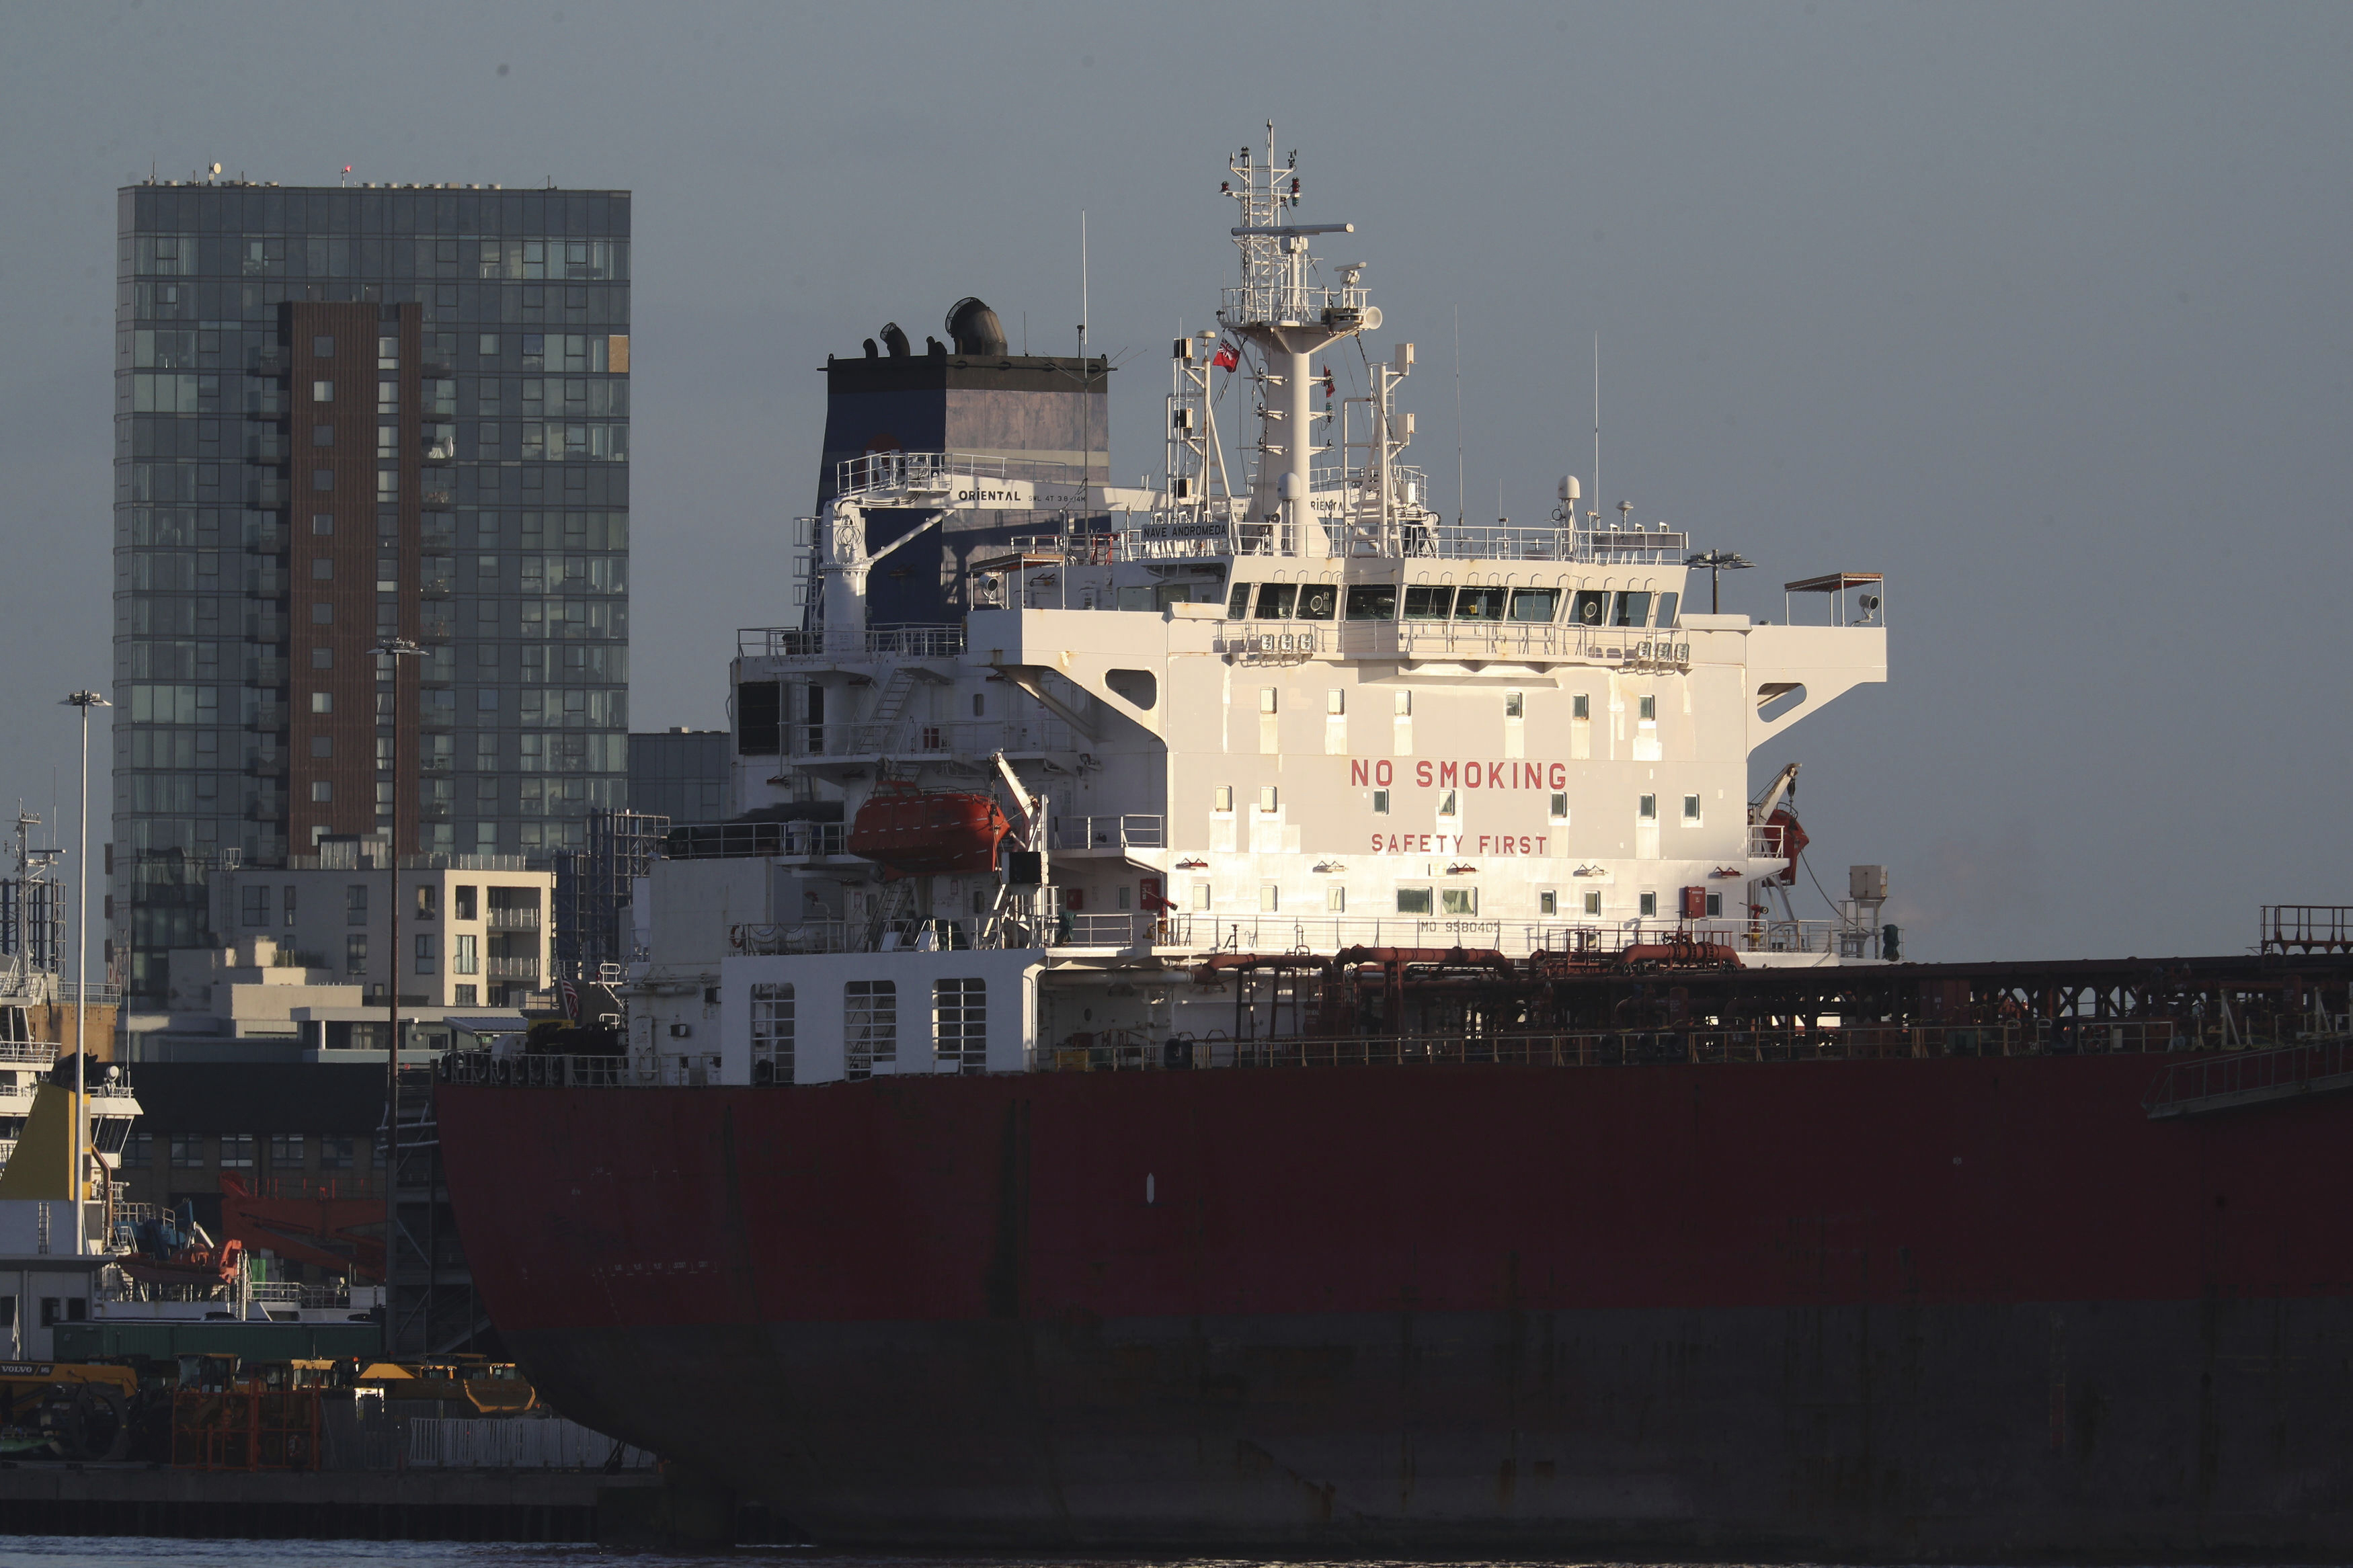 7 held for suspected tanker hijack after UK commando raid